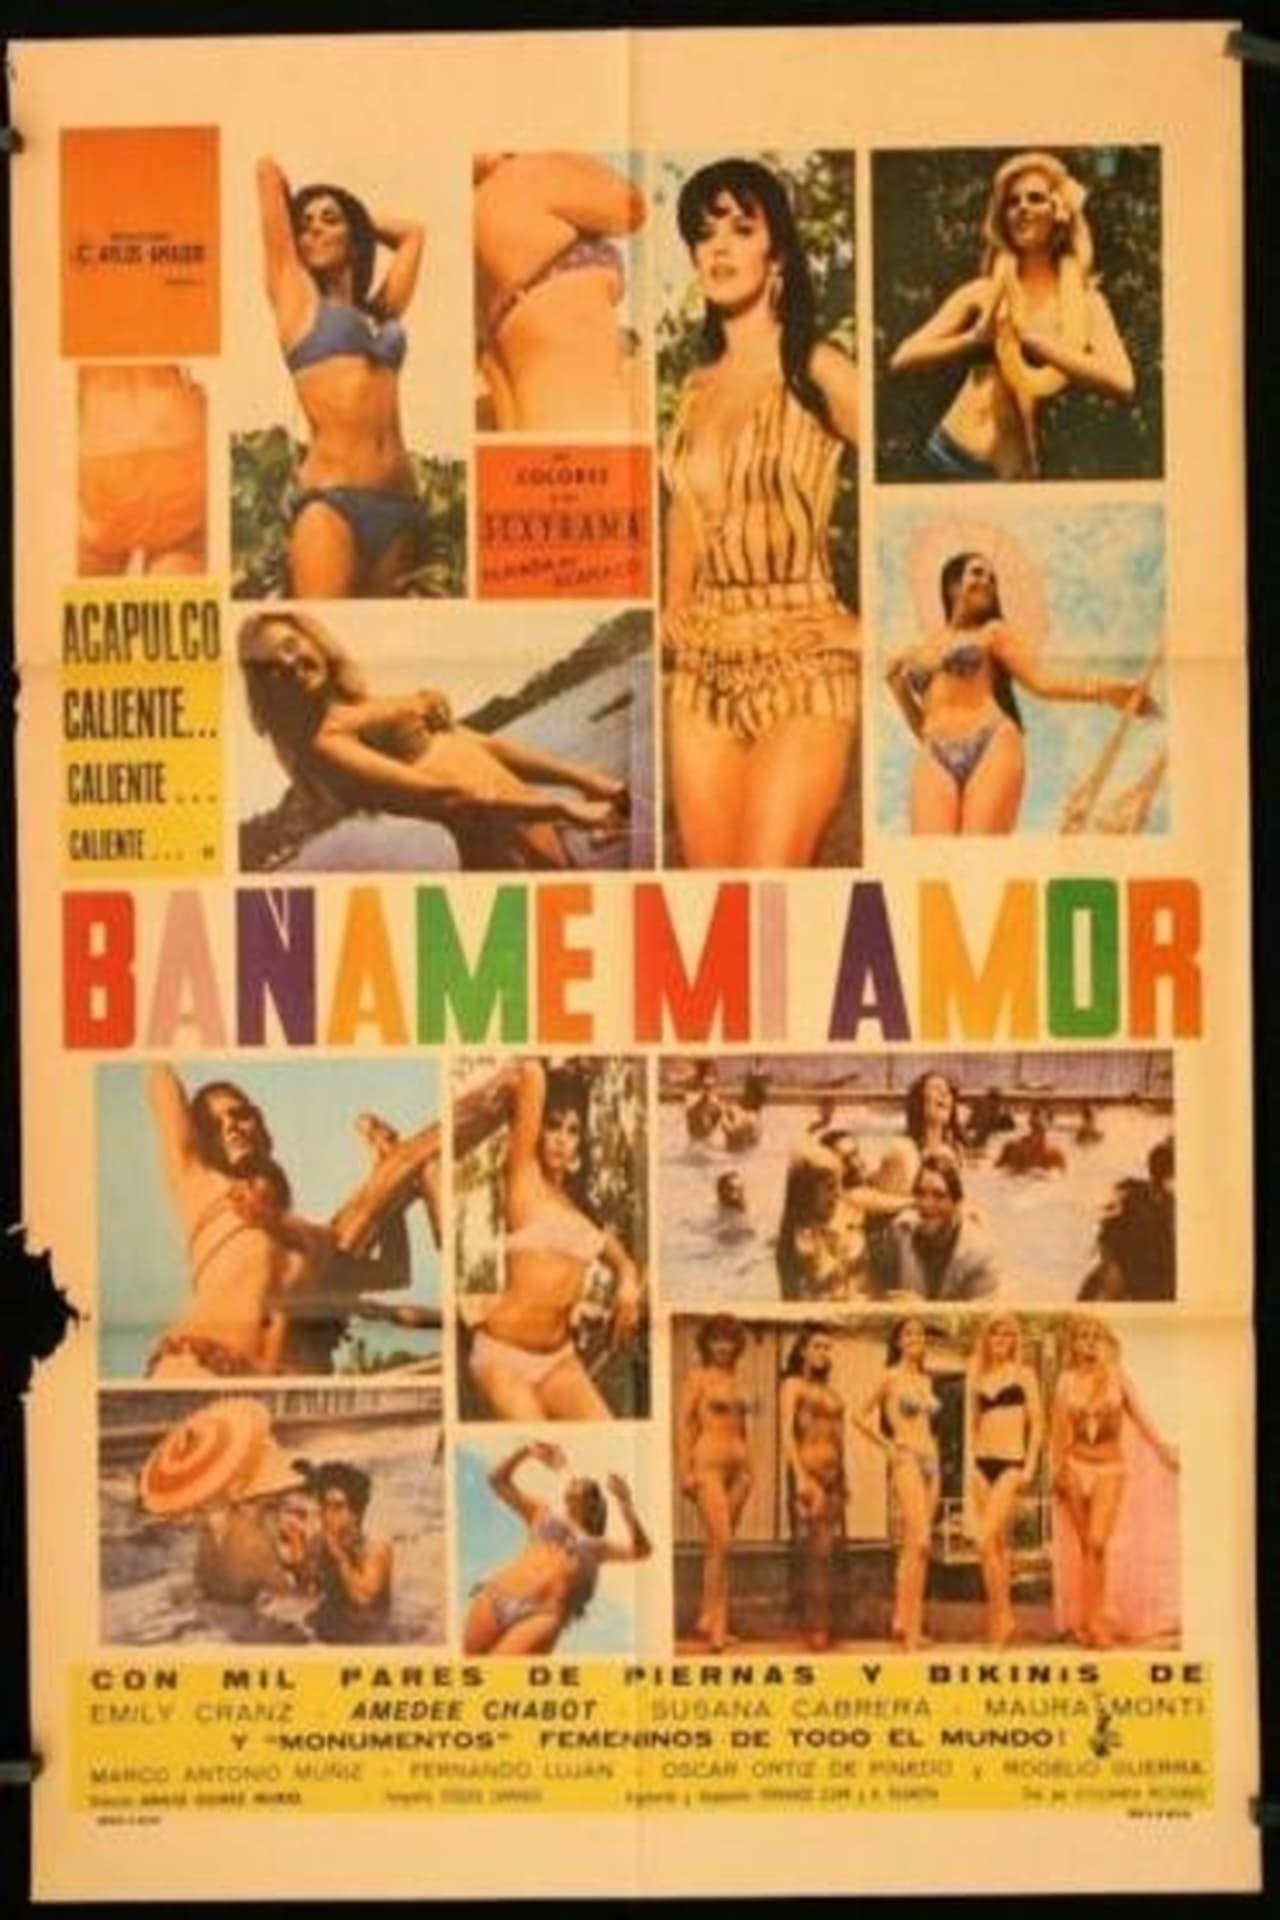 Amadee Chabot 01:30:00] download, streaming & watch báñame mi amor (1968